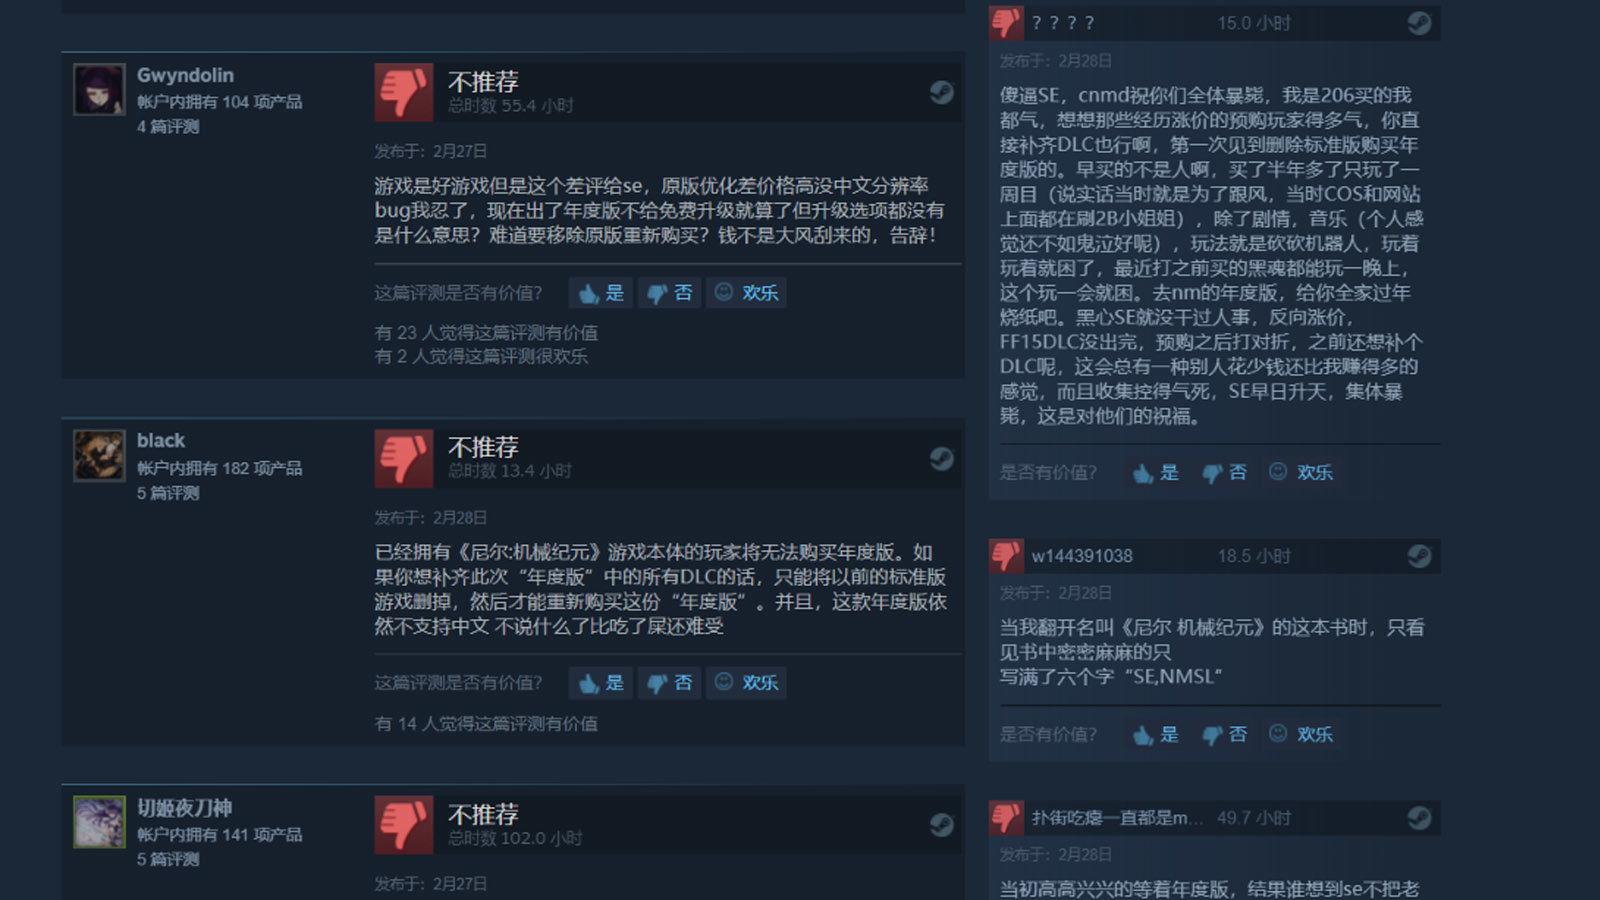 STEAM《尼尔 自动人形》年度版国区页面遭老玩家大量差评